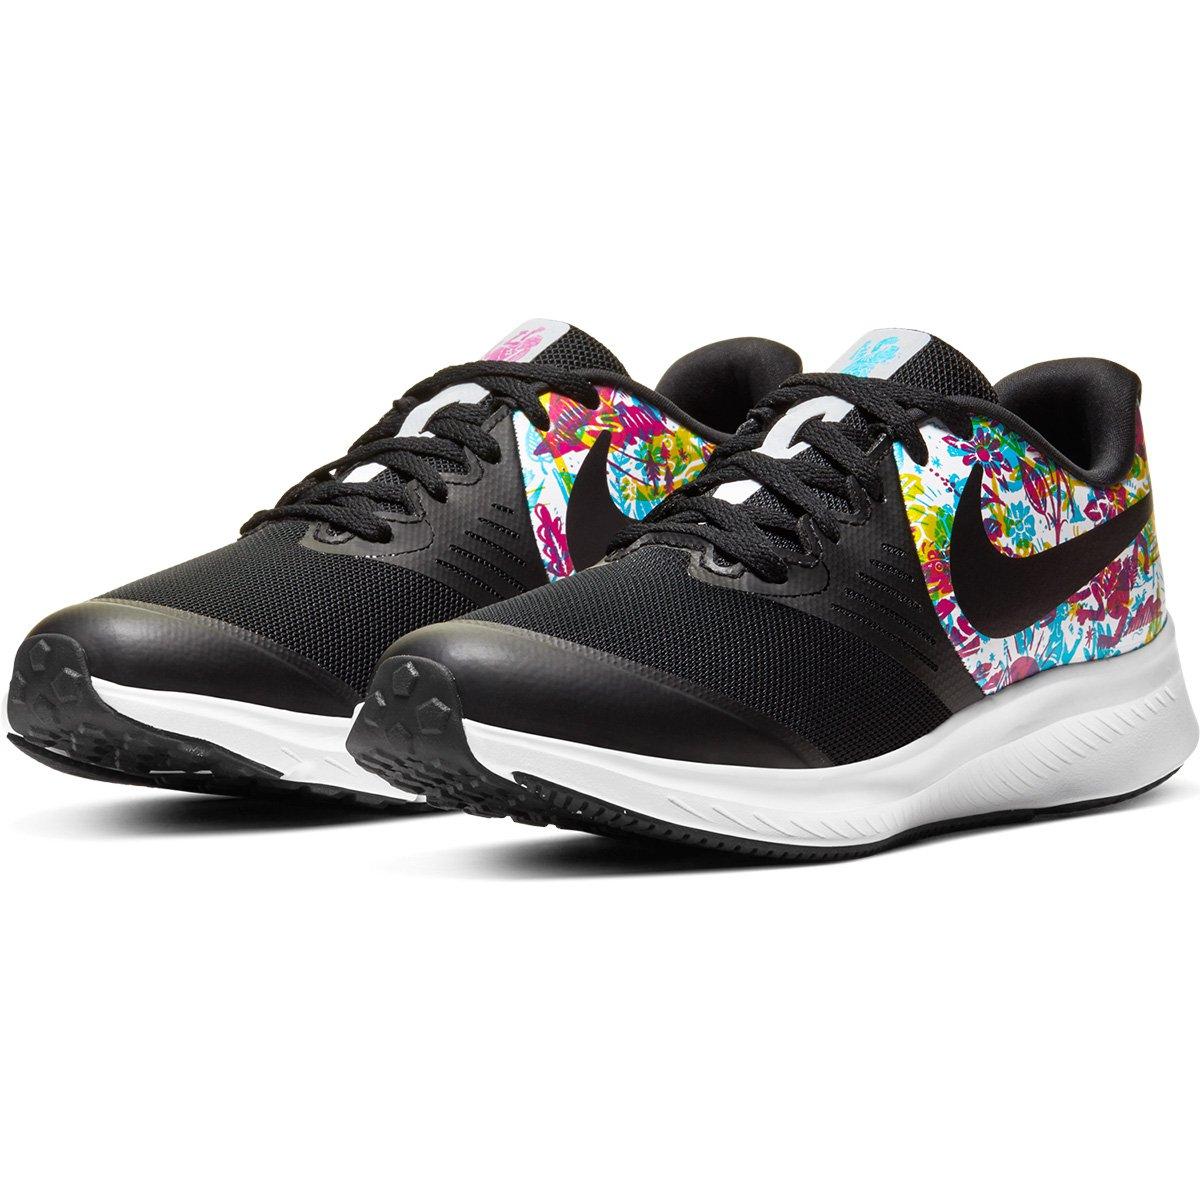 Hito agencia Tranquilidad  Tênis Infantil Nike Star Runner 2 Fable   Shop Timão